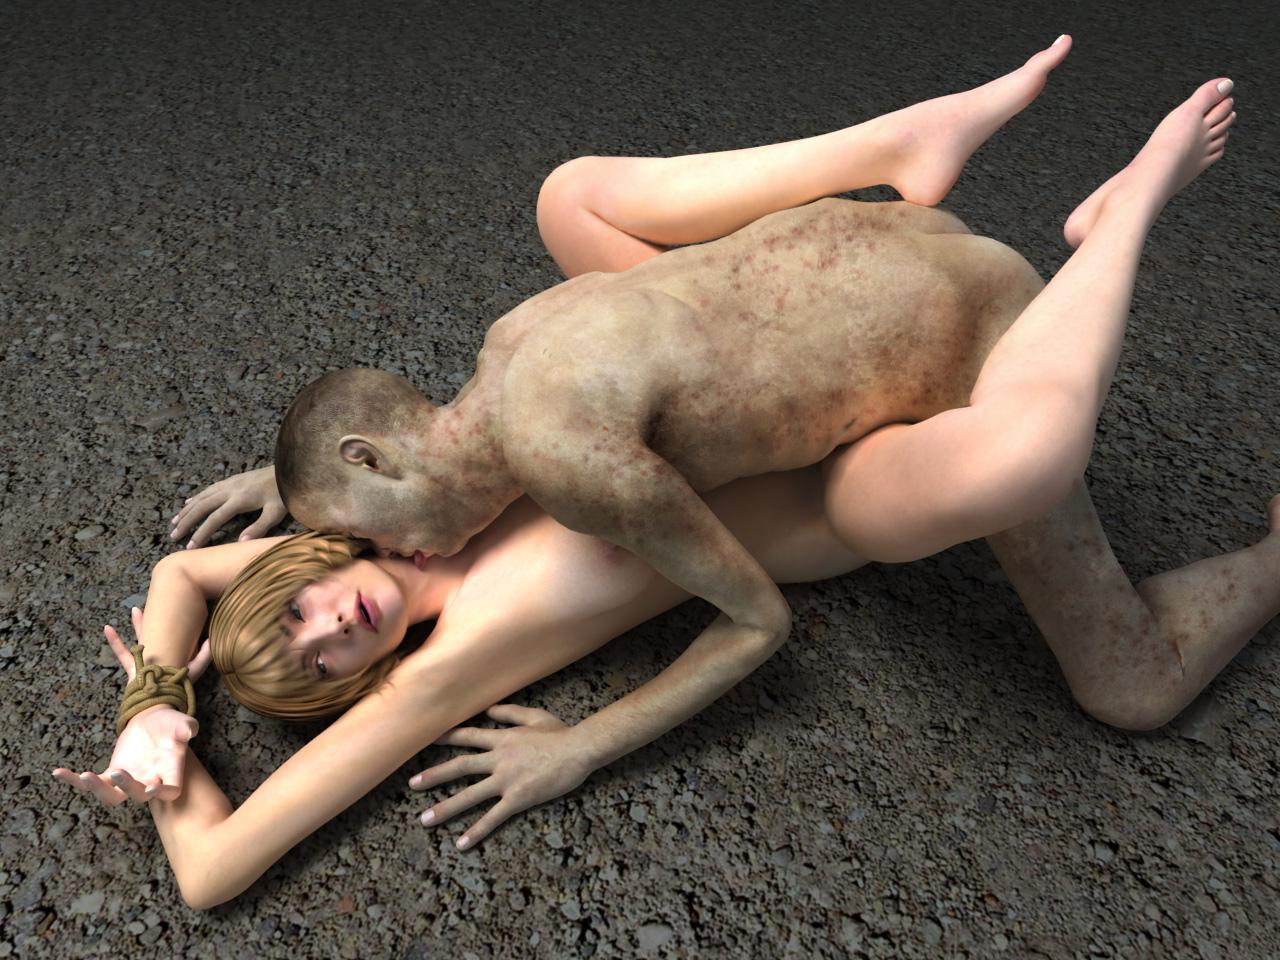 3d slave porn pics naked streaming